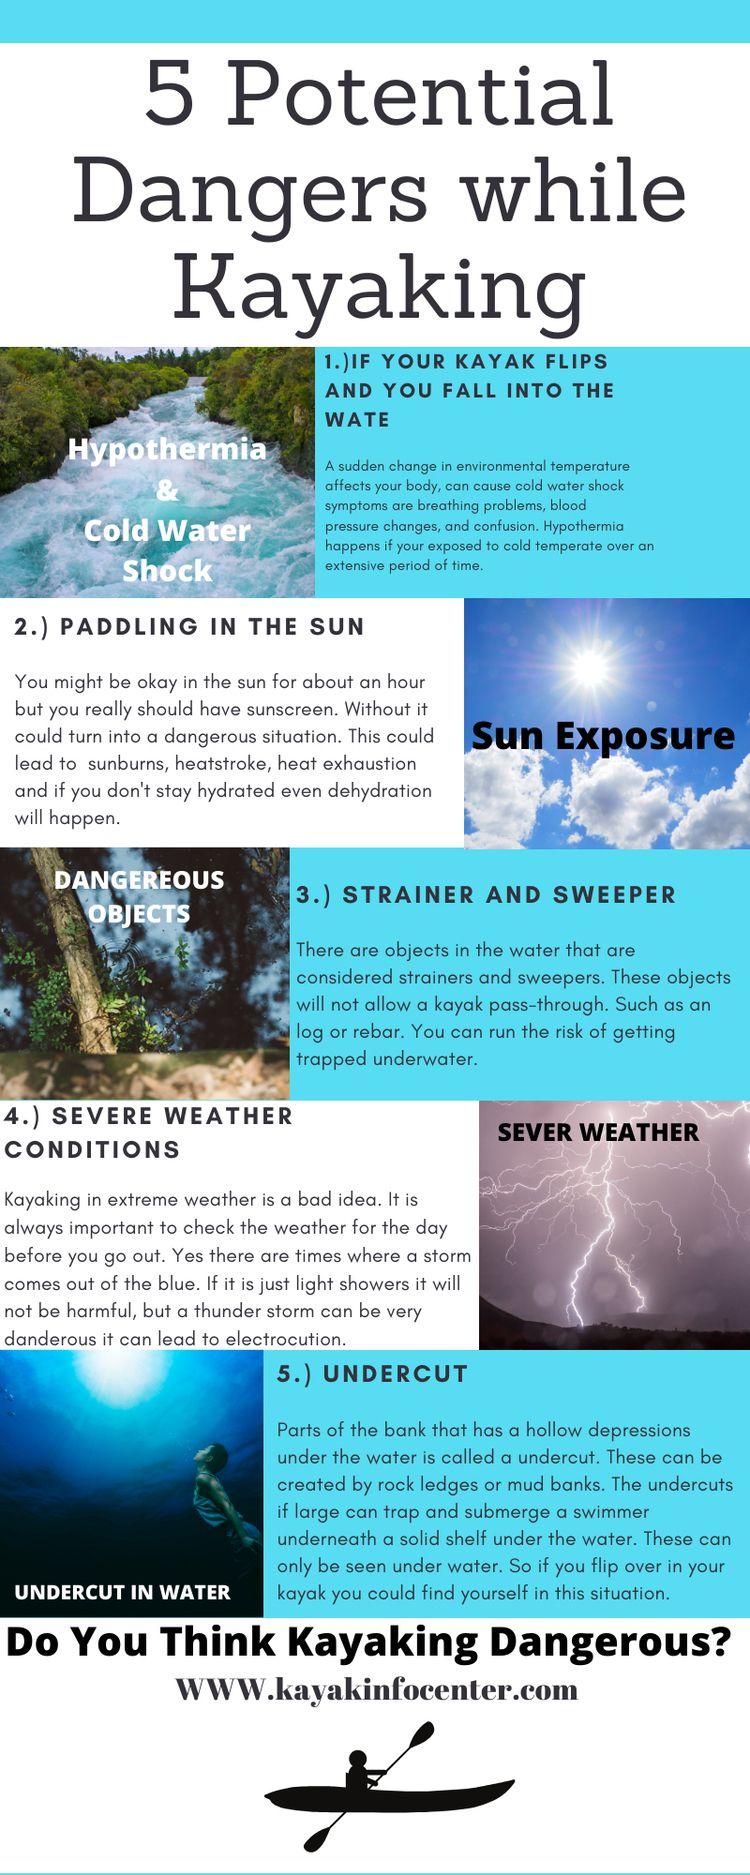 5 Potential Dangers Kayaking [I - zoeinfographic | ello